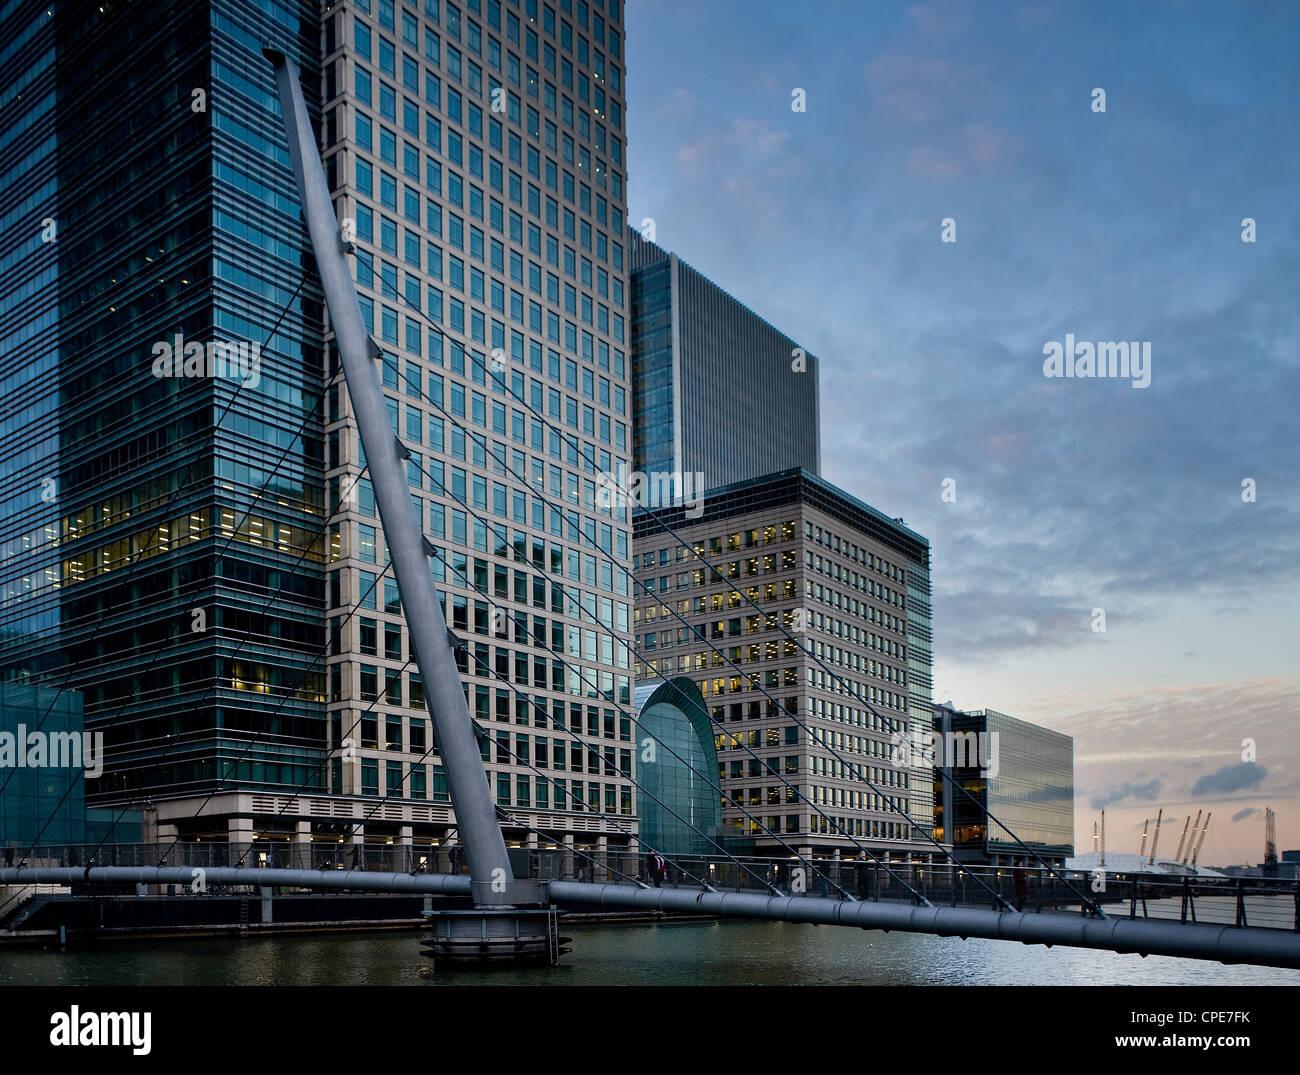 Canary Wharf, Docklands, London, England, Vereinigtes Königreich, Europa Stockbild